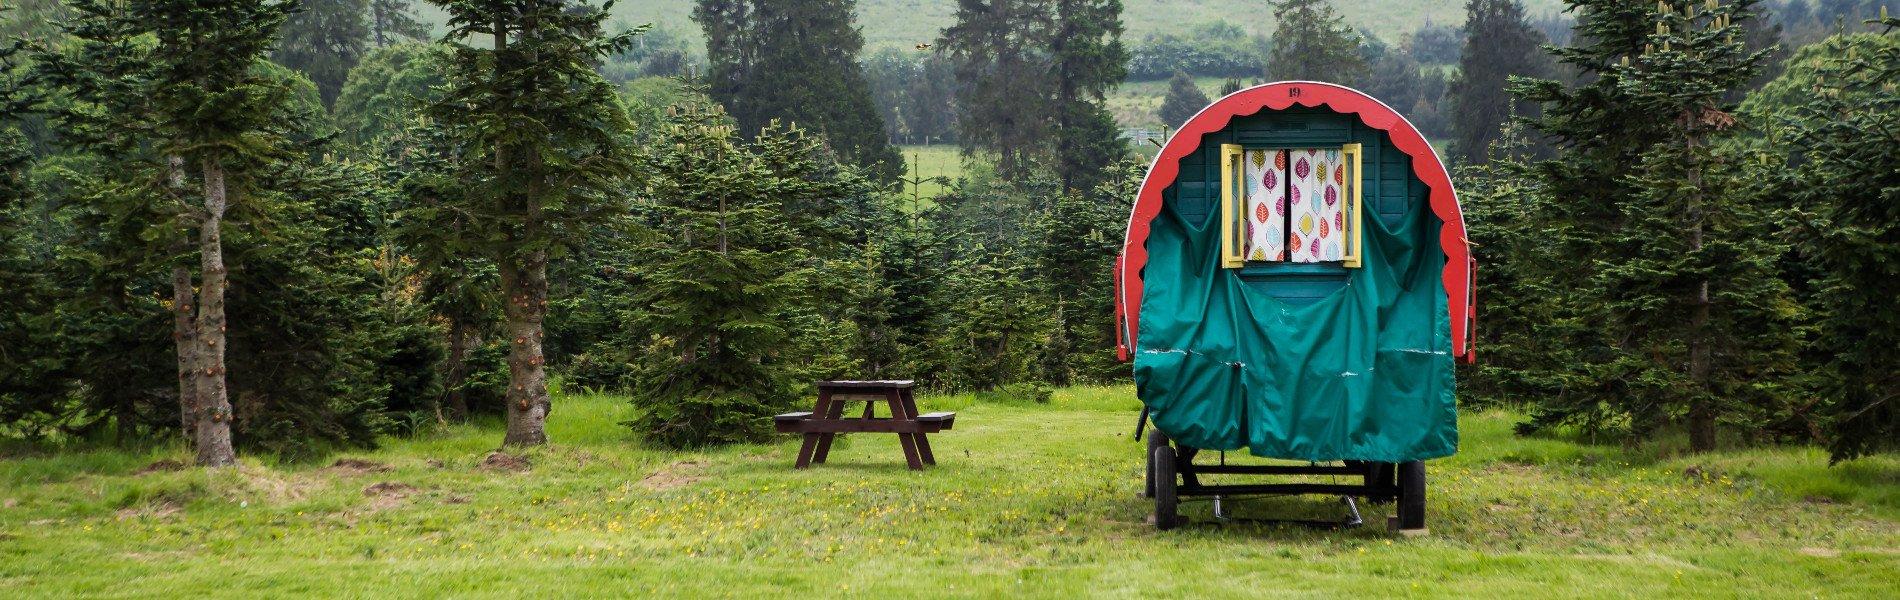 Glamping in a gypsy caravan at Clissmann Horse Caravans in Wicklow, Ireland